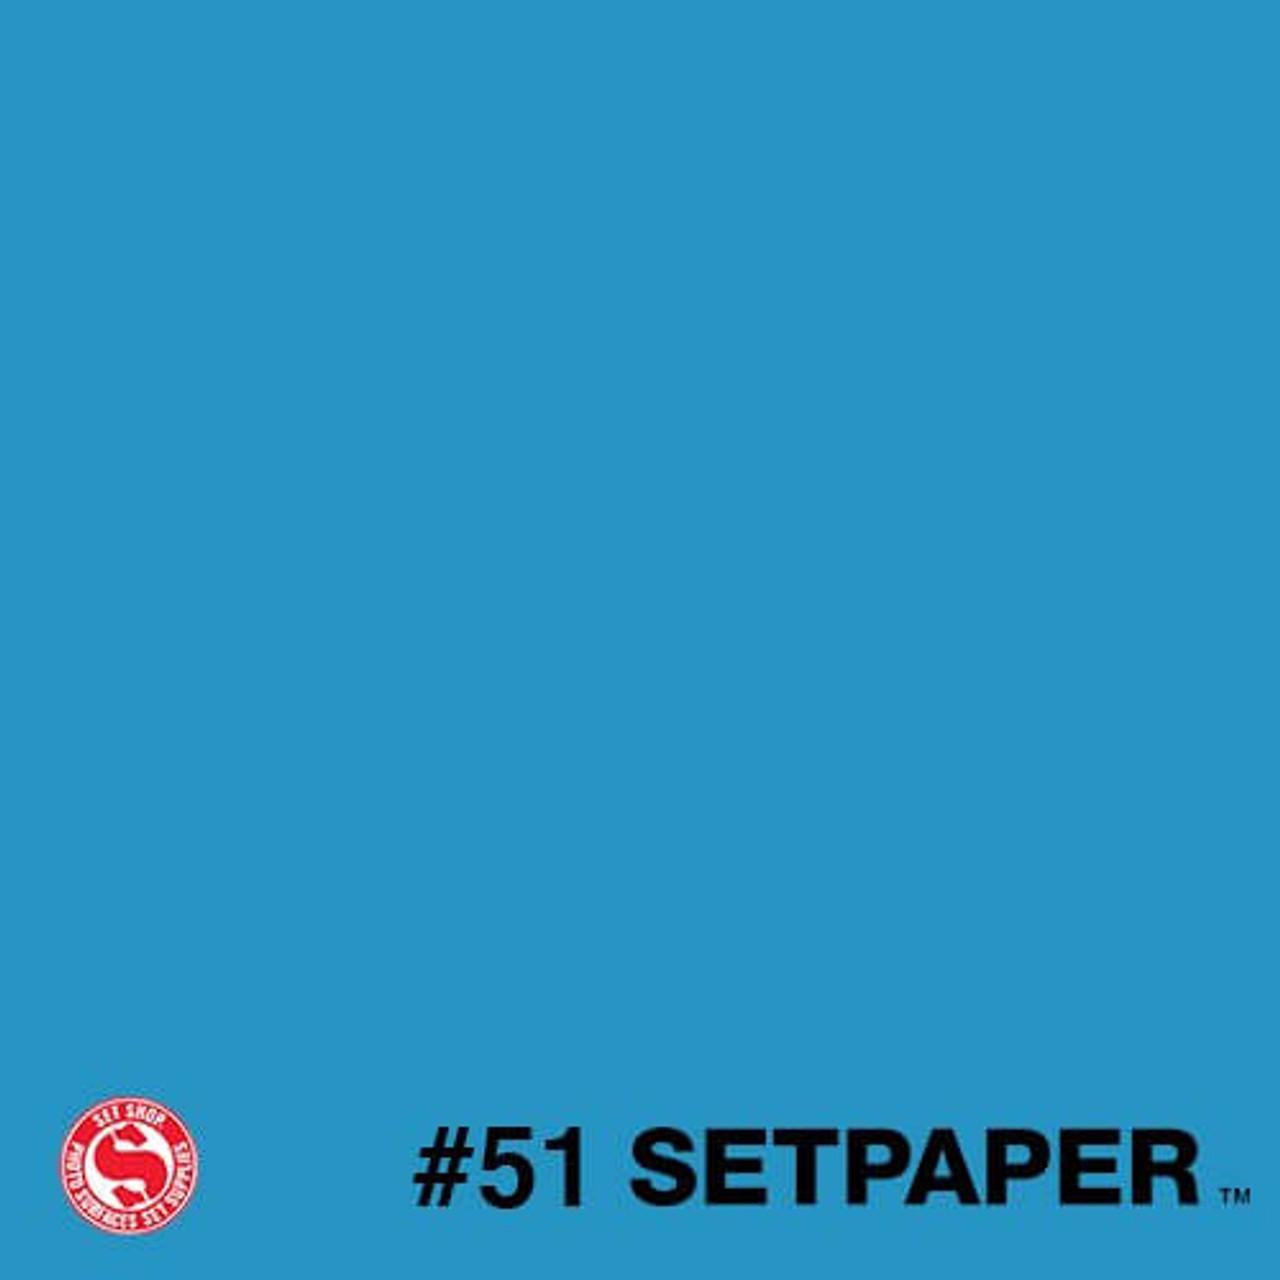 "151 SETPAPER - REGAL BLUE 53"" x 36' (1.3 x 11m)"